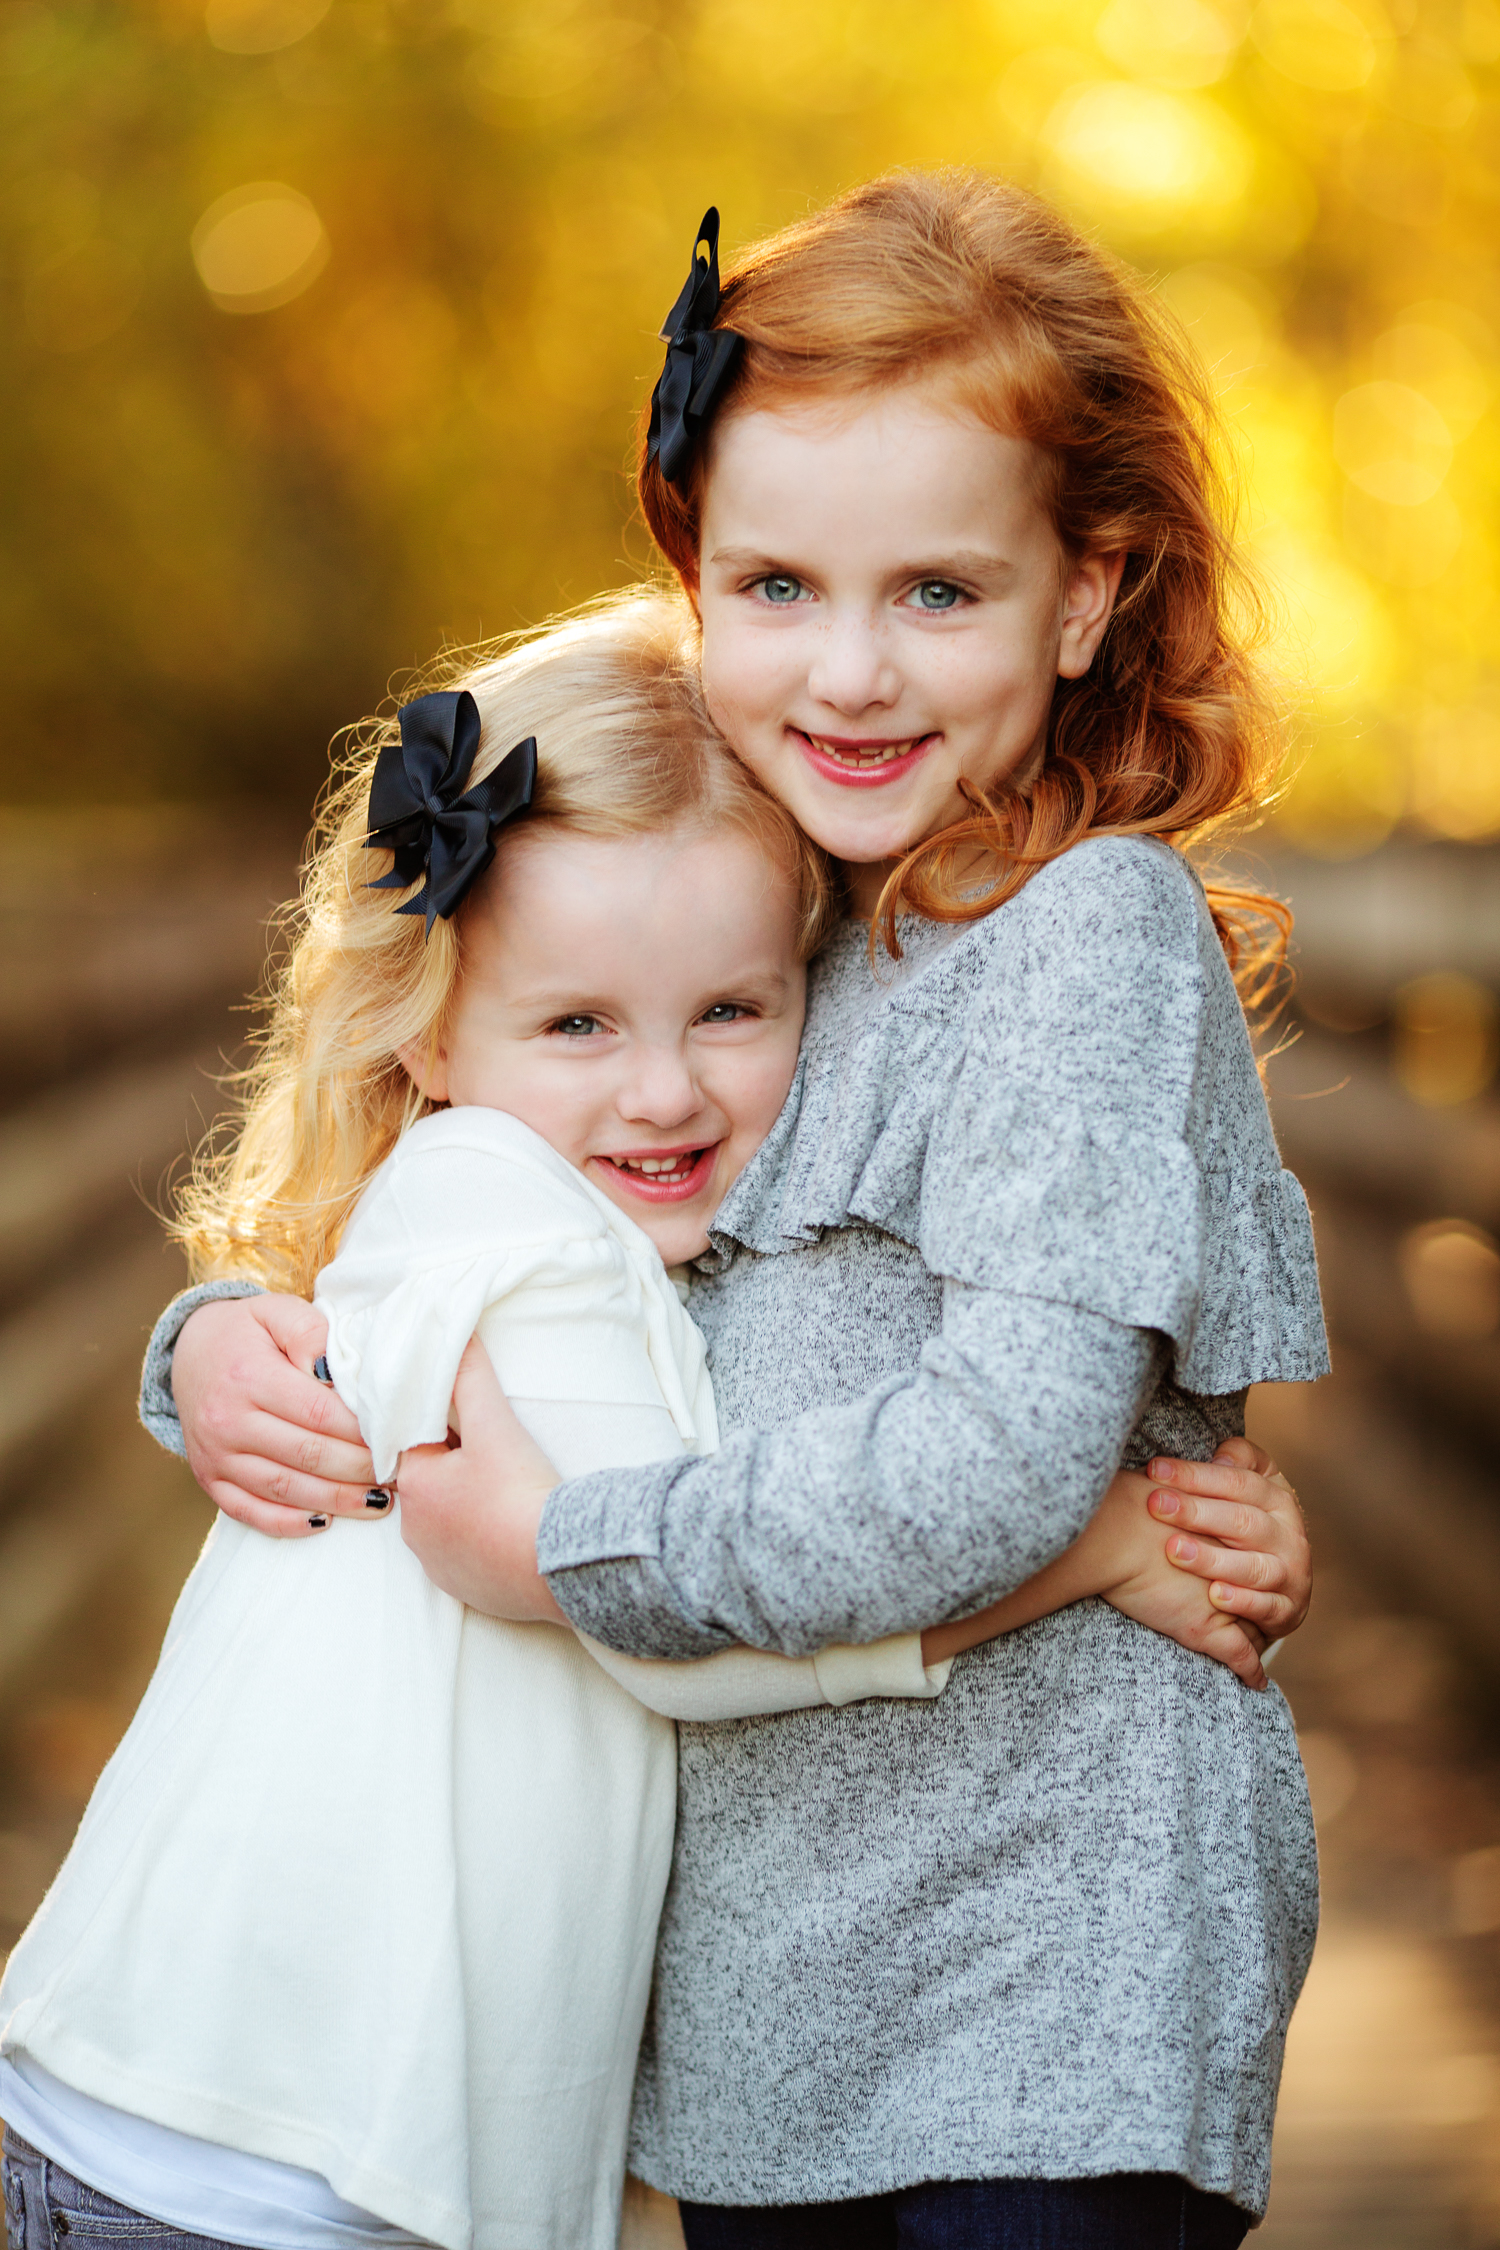 ariellanoellephotography-family-portrait-session-fall-mini-photographer-seniors-highschool-portraiture-child-photographer-3.jpg